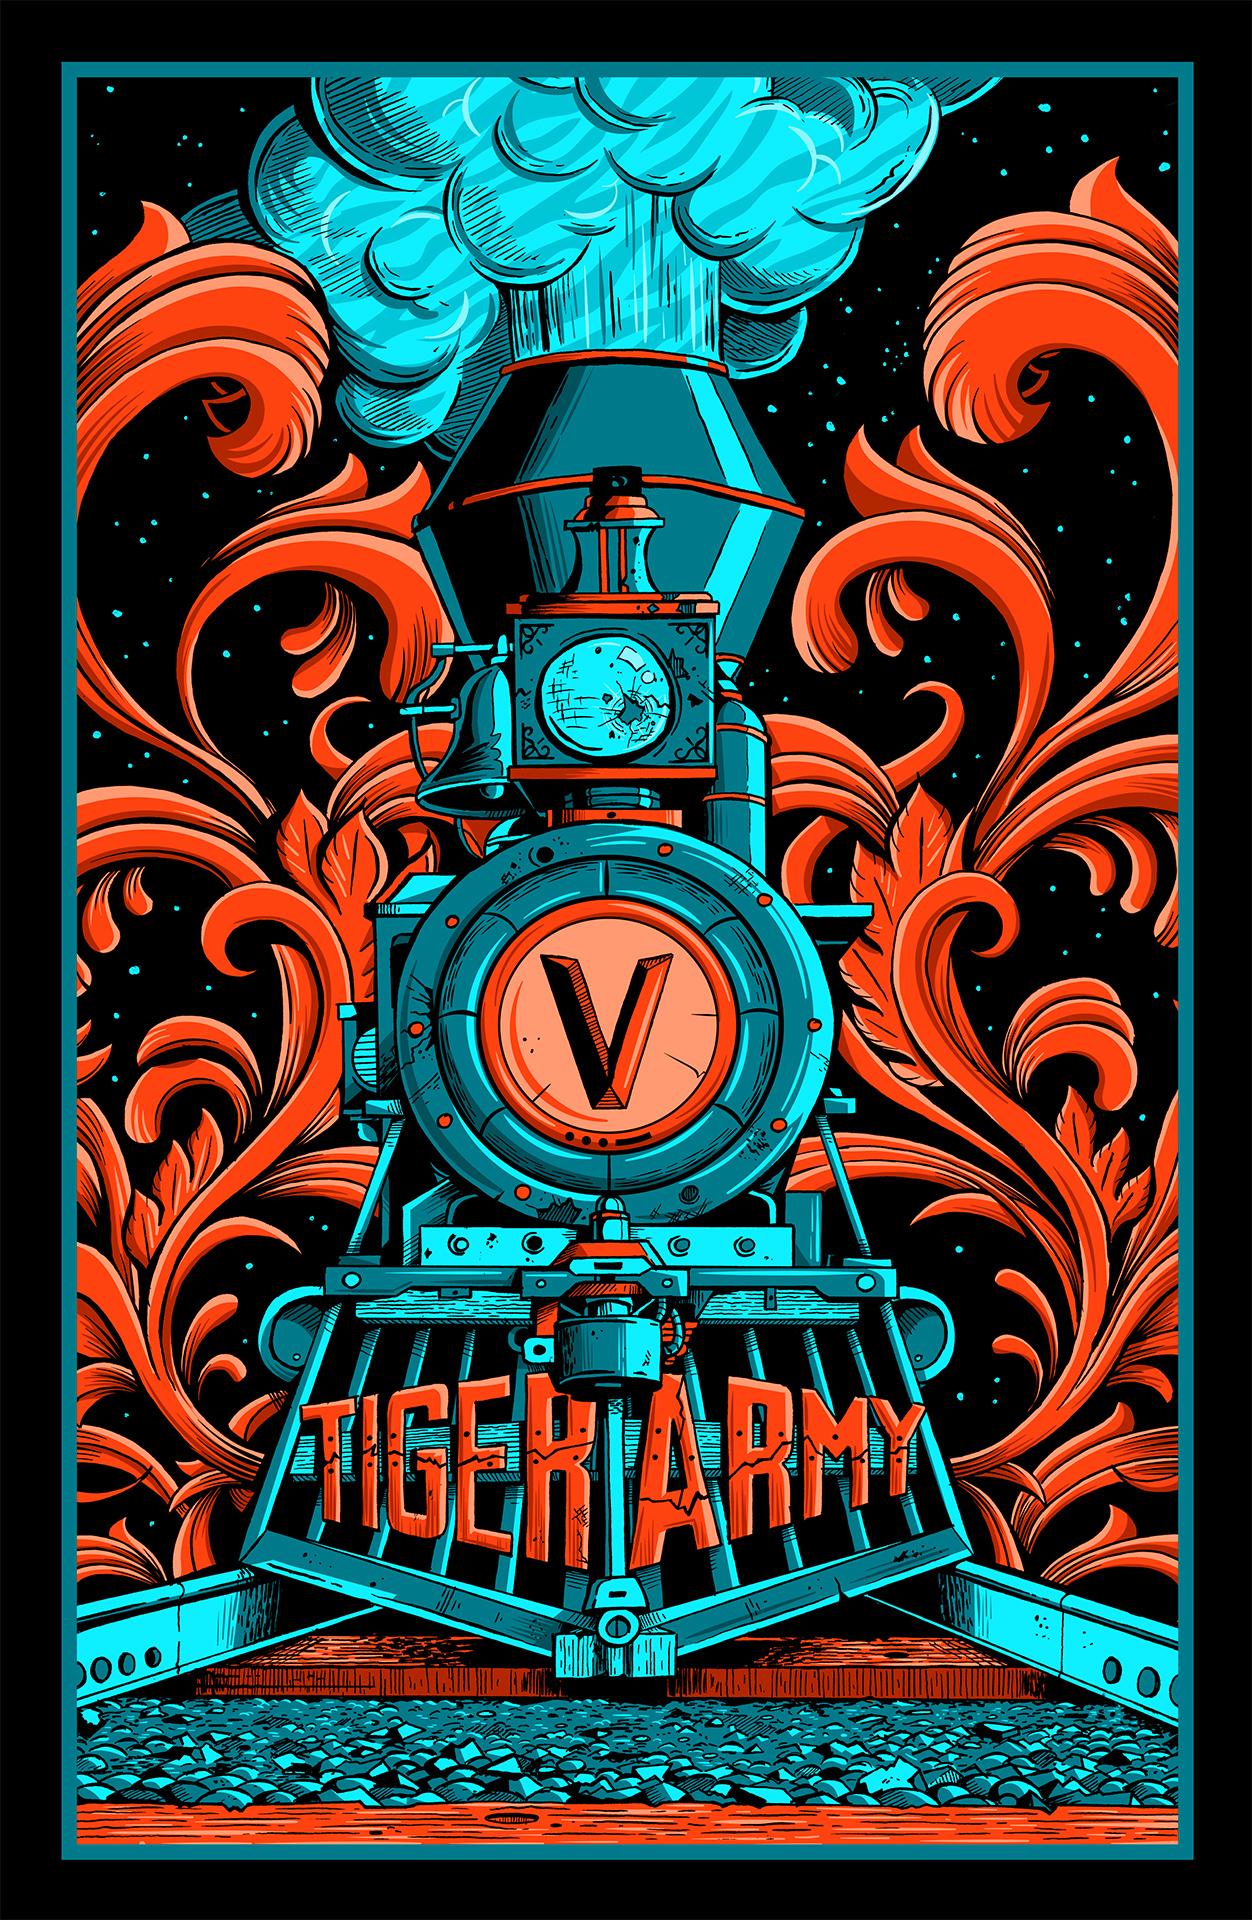 Tiger Army / Train to Eternity